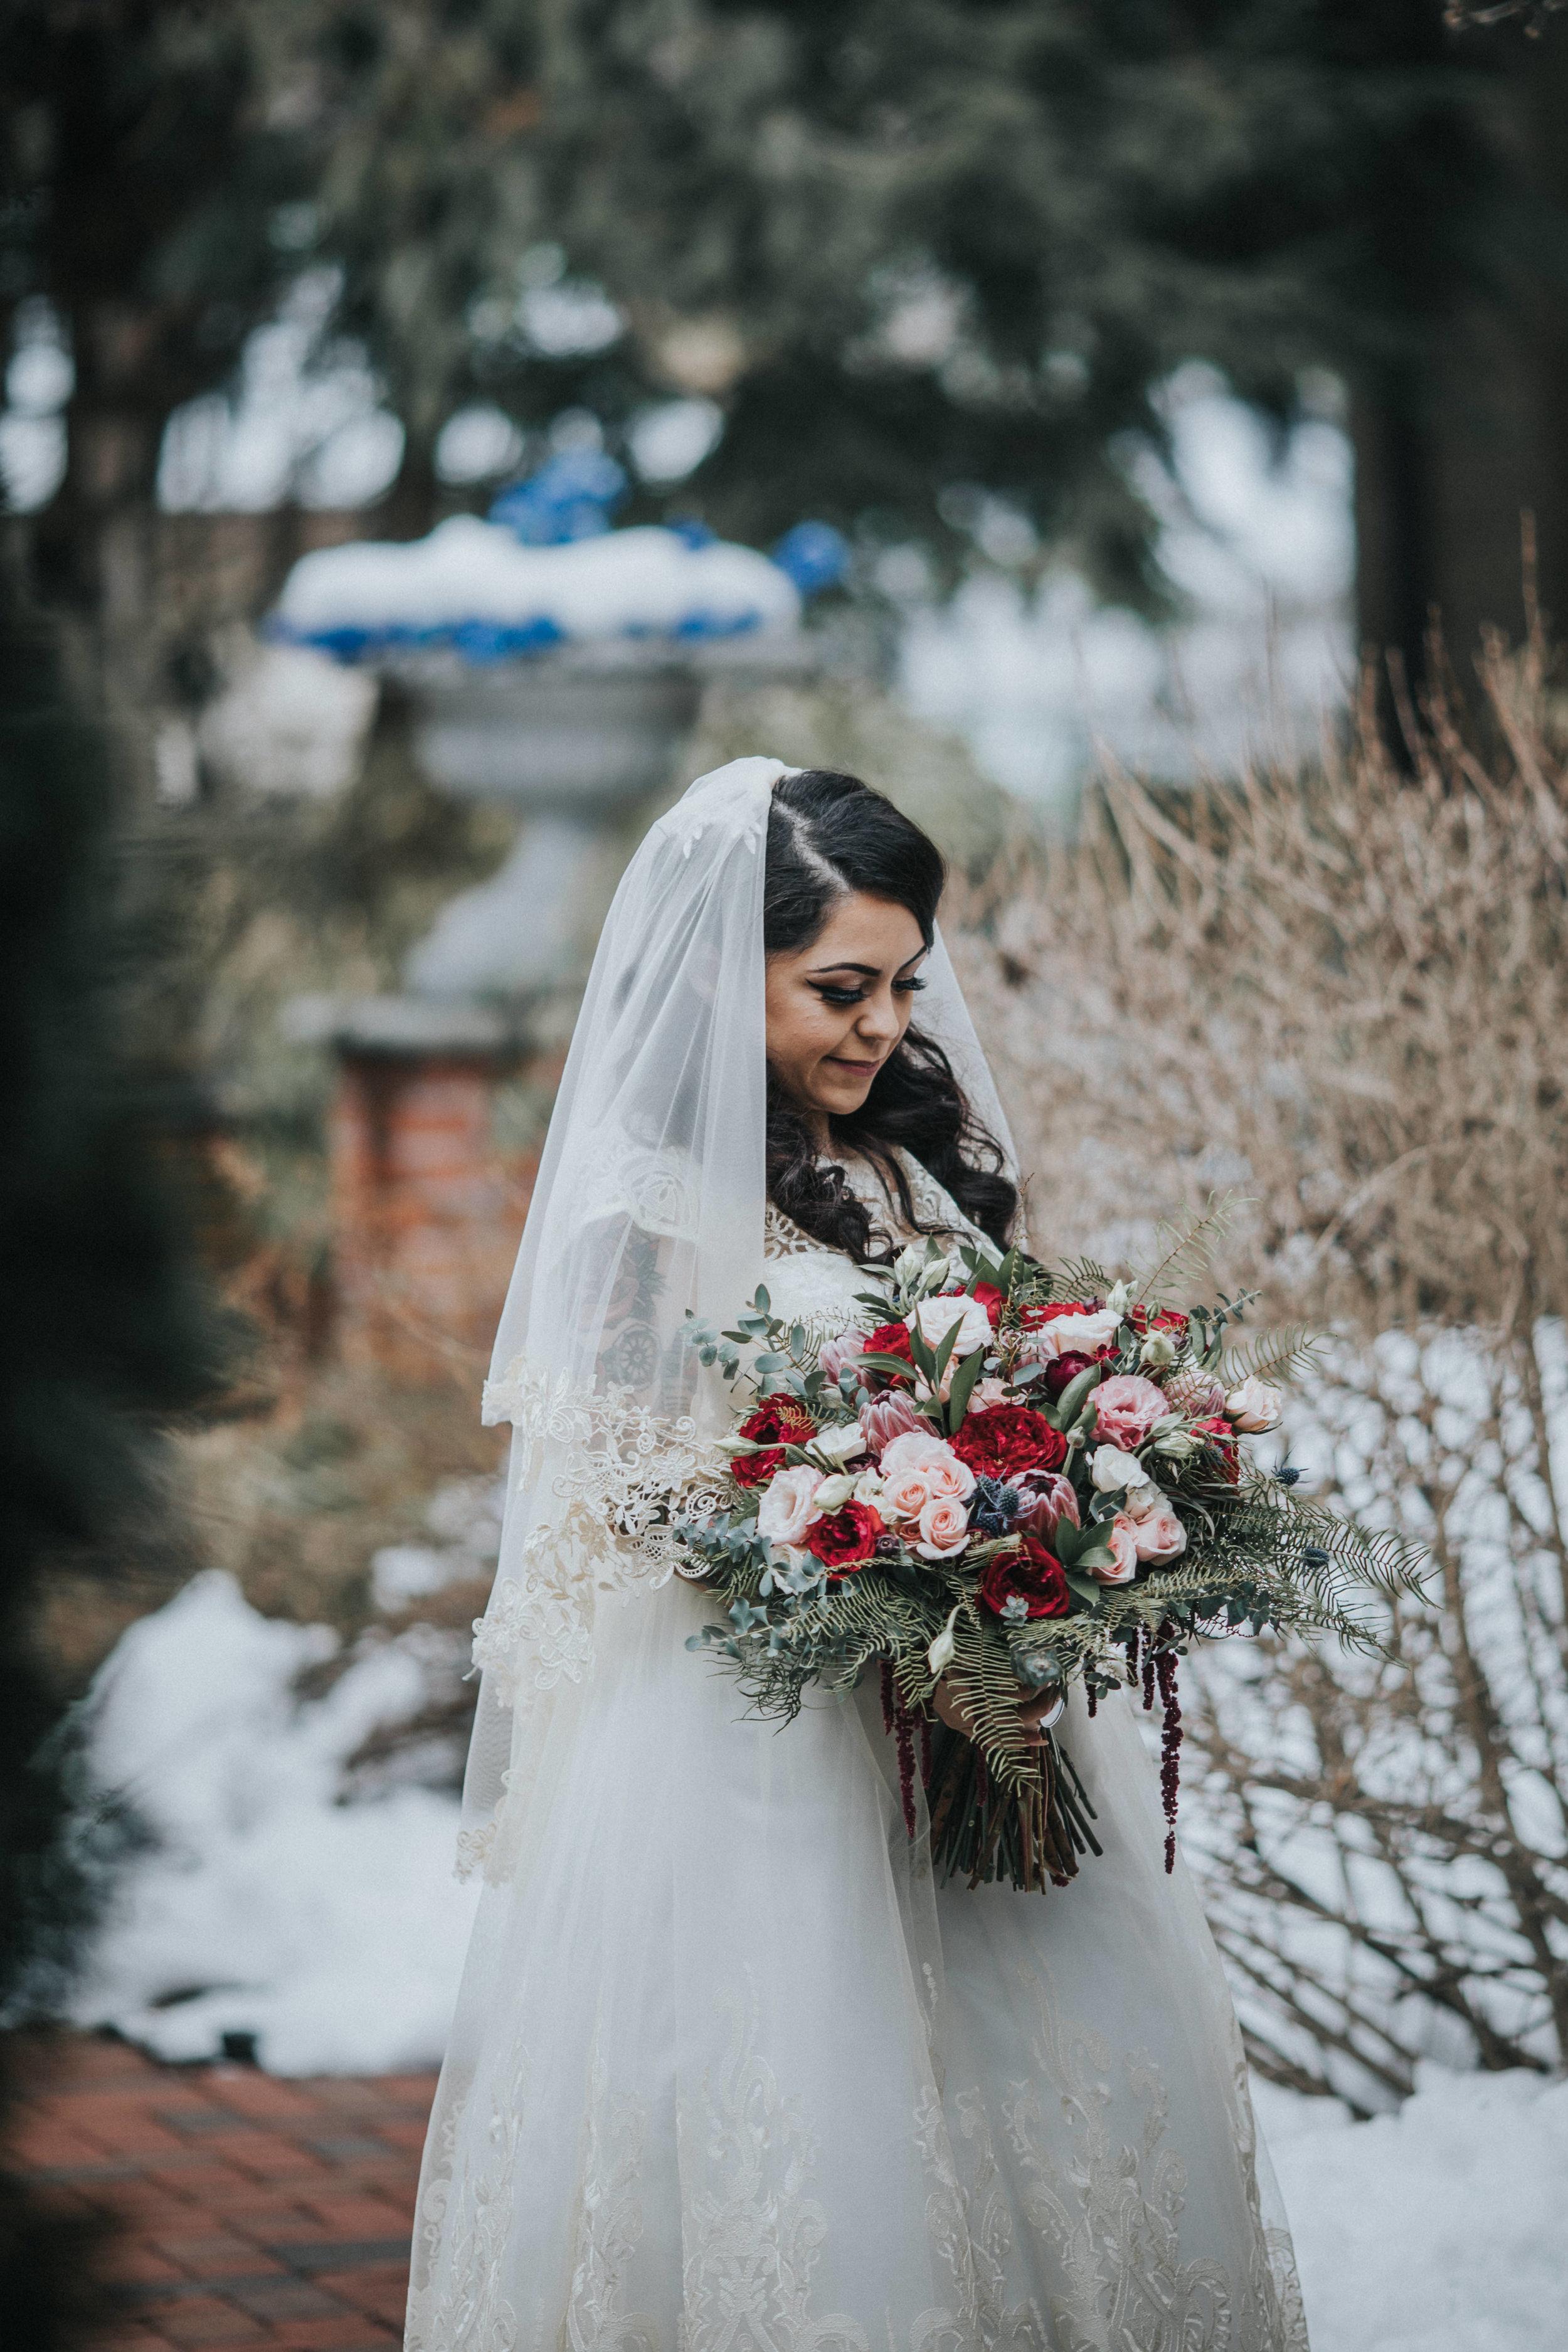 New-Jersey-Wedding-Photographer-ReceptionCenter-Valeria&Mike-First-Look-Bride&Groom (22 of 69).jpg